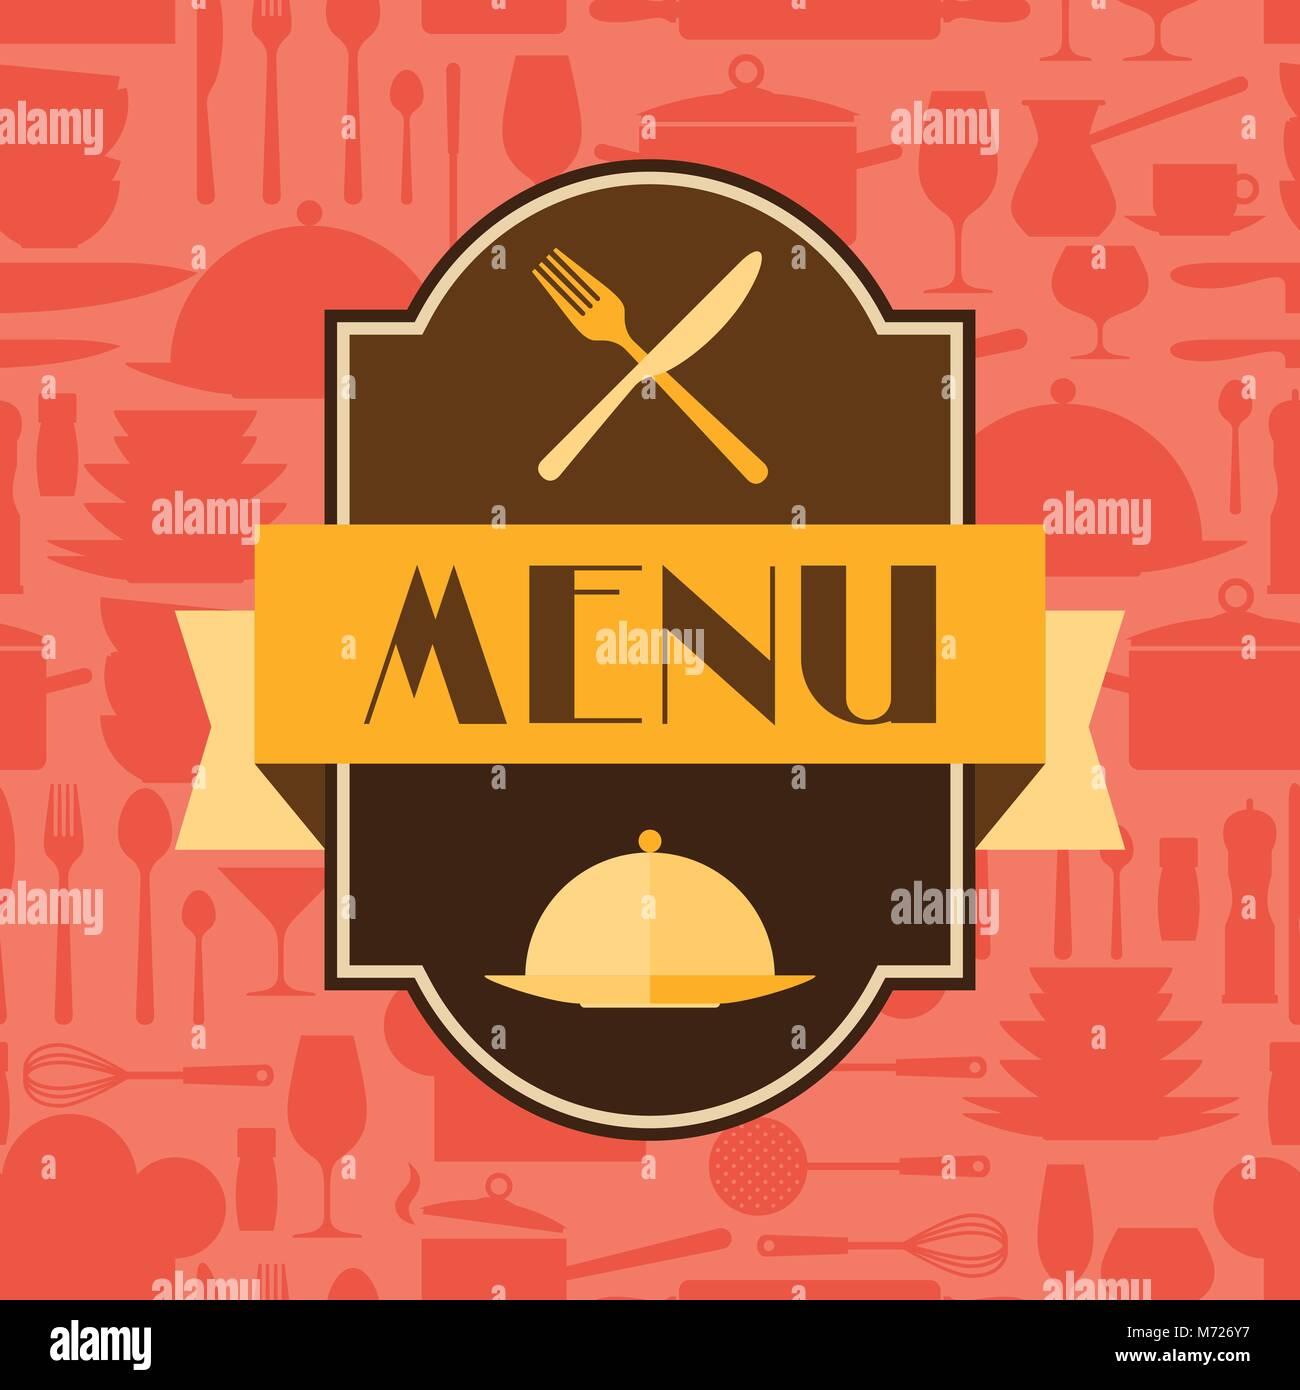 Restaurant Menu Background In Flat Design Style Stock Vector Image Art Alamy